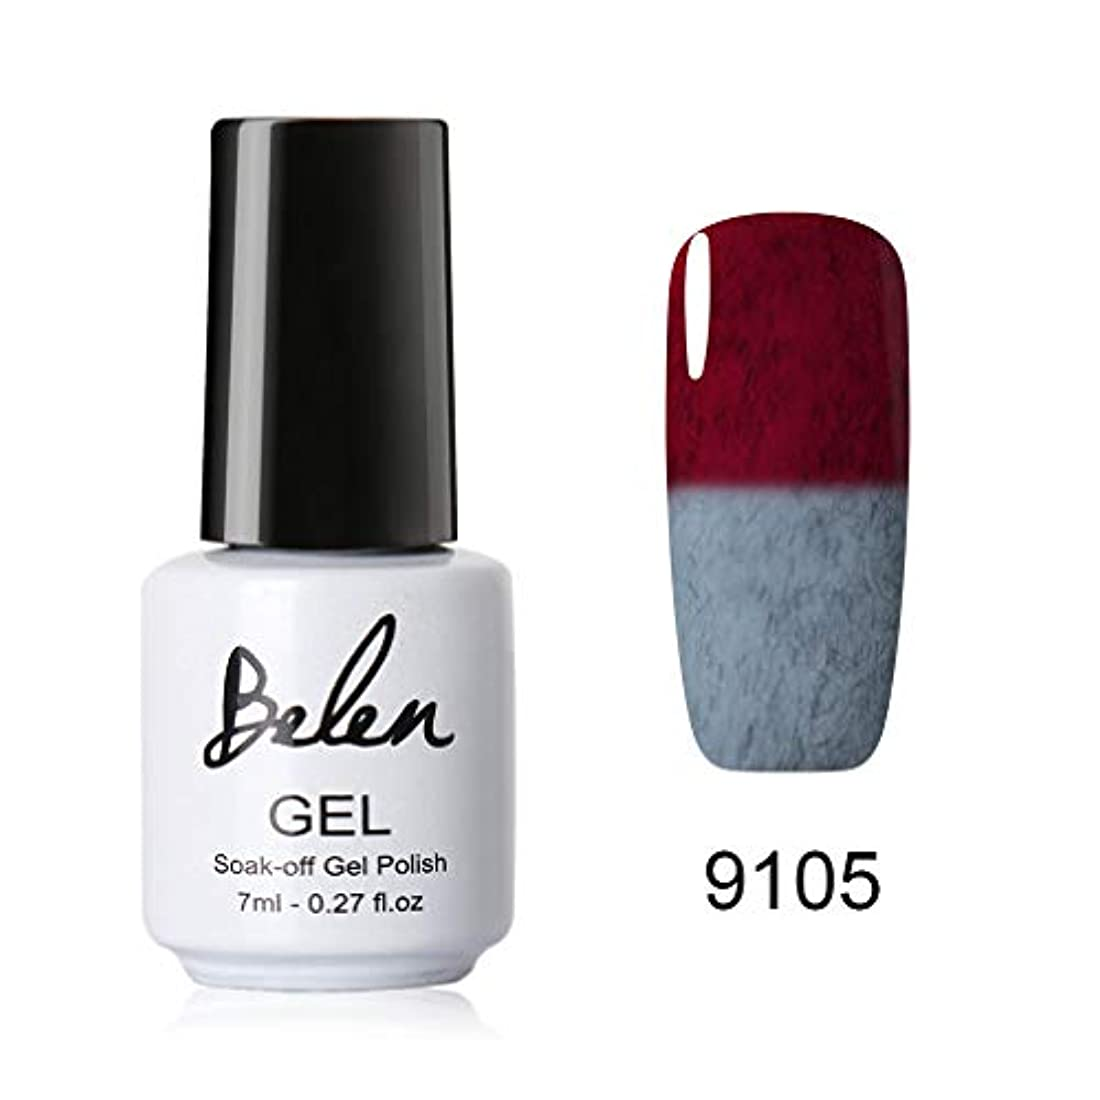 Belen ジェルネイル カラージェル 毛皮系 カメレオンカラージェル 温度により色が変化 1色入り 7ml 【全6 色選択可】